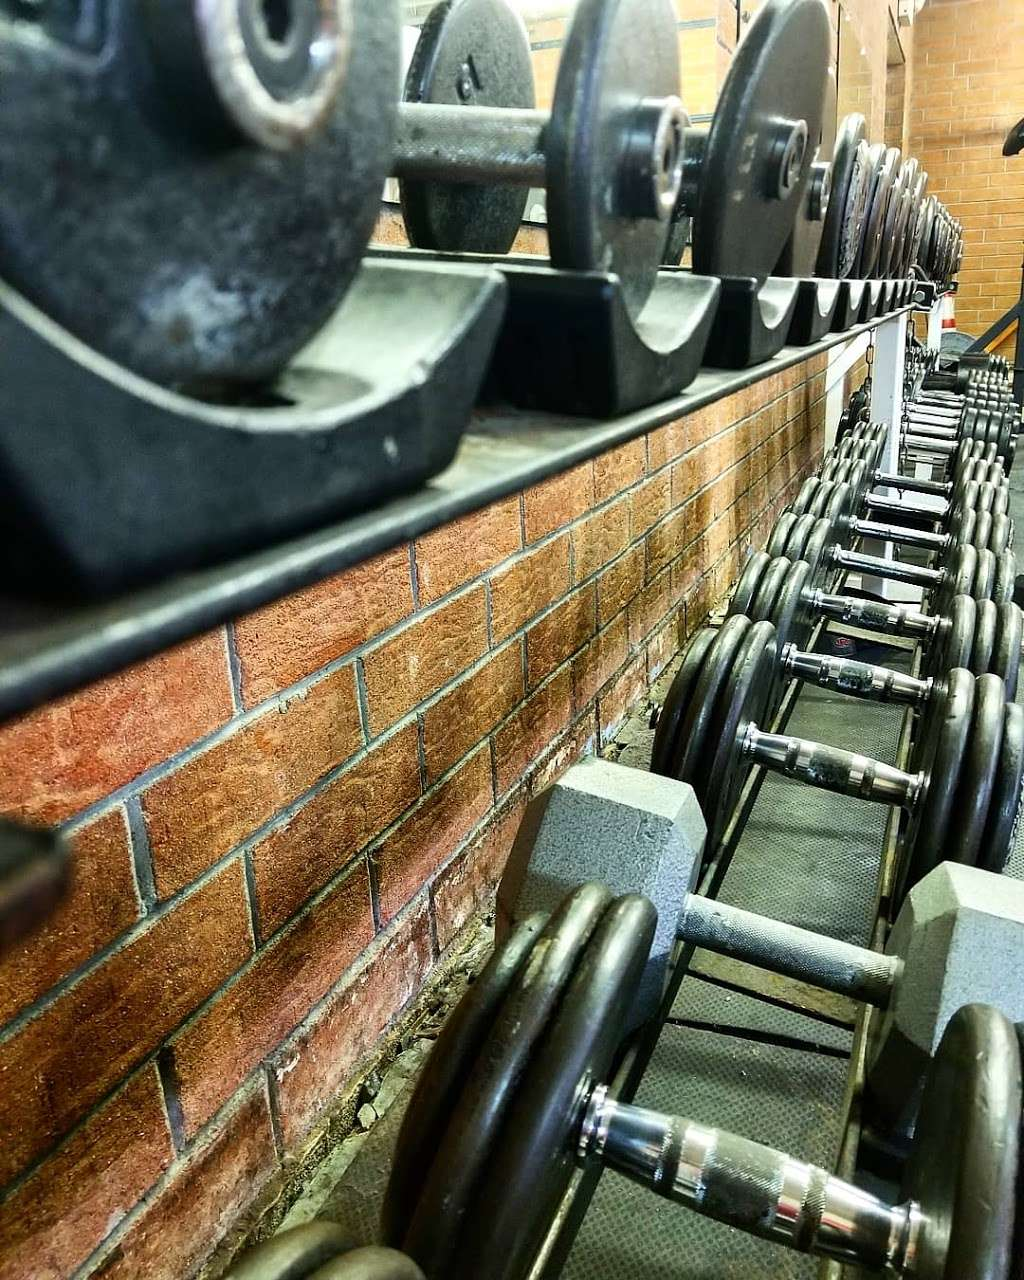 Kingdom Fitness LLC - gym  | Photo 3 of 5 | Address: S Pink St, Cherryville, NC 28021, USA | Phone: (704) 300-2316